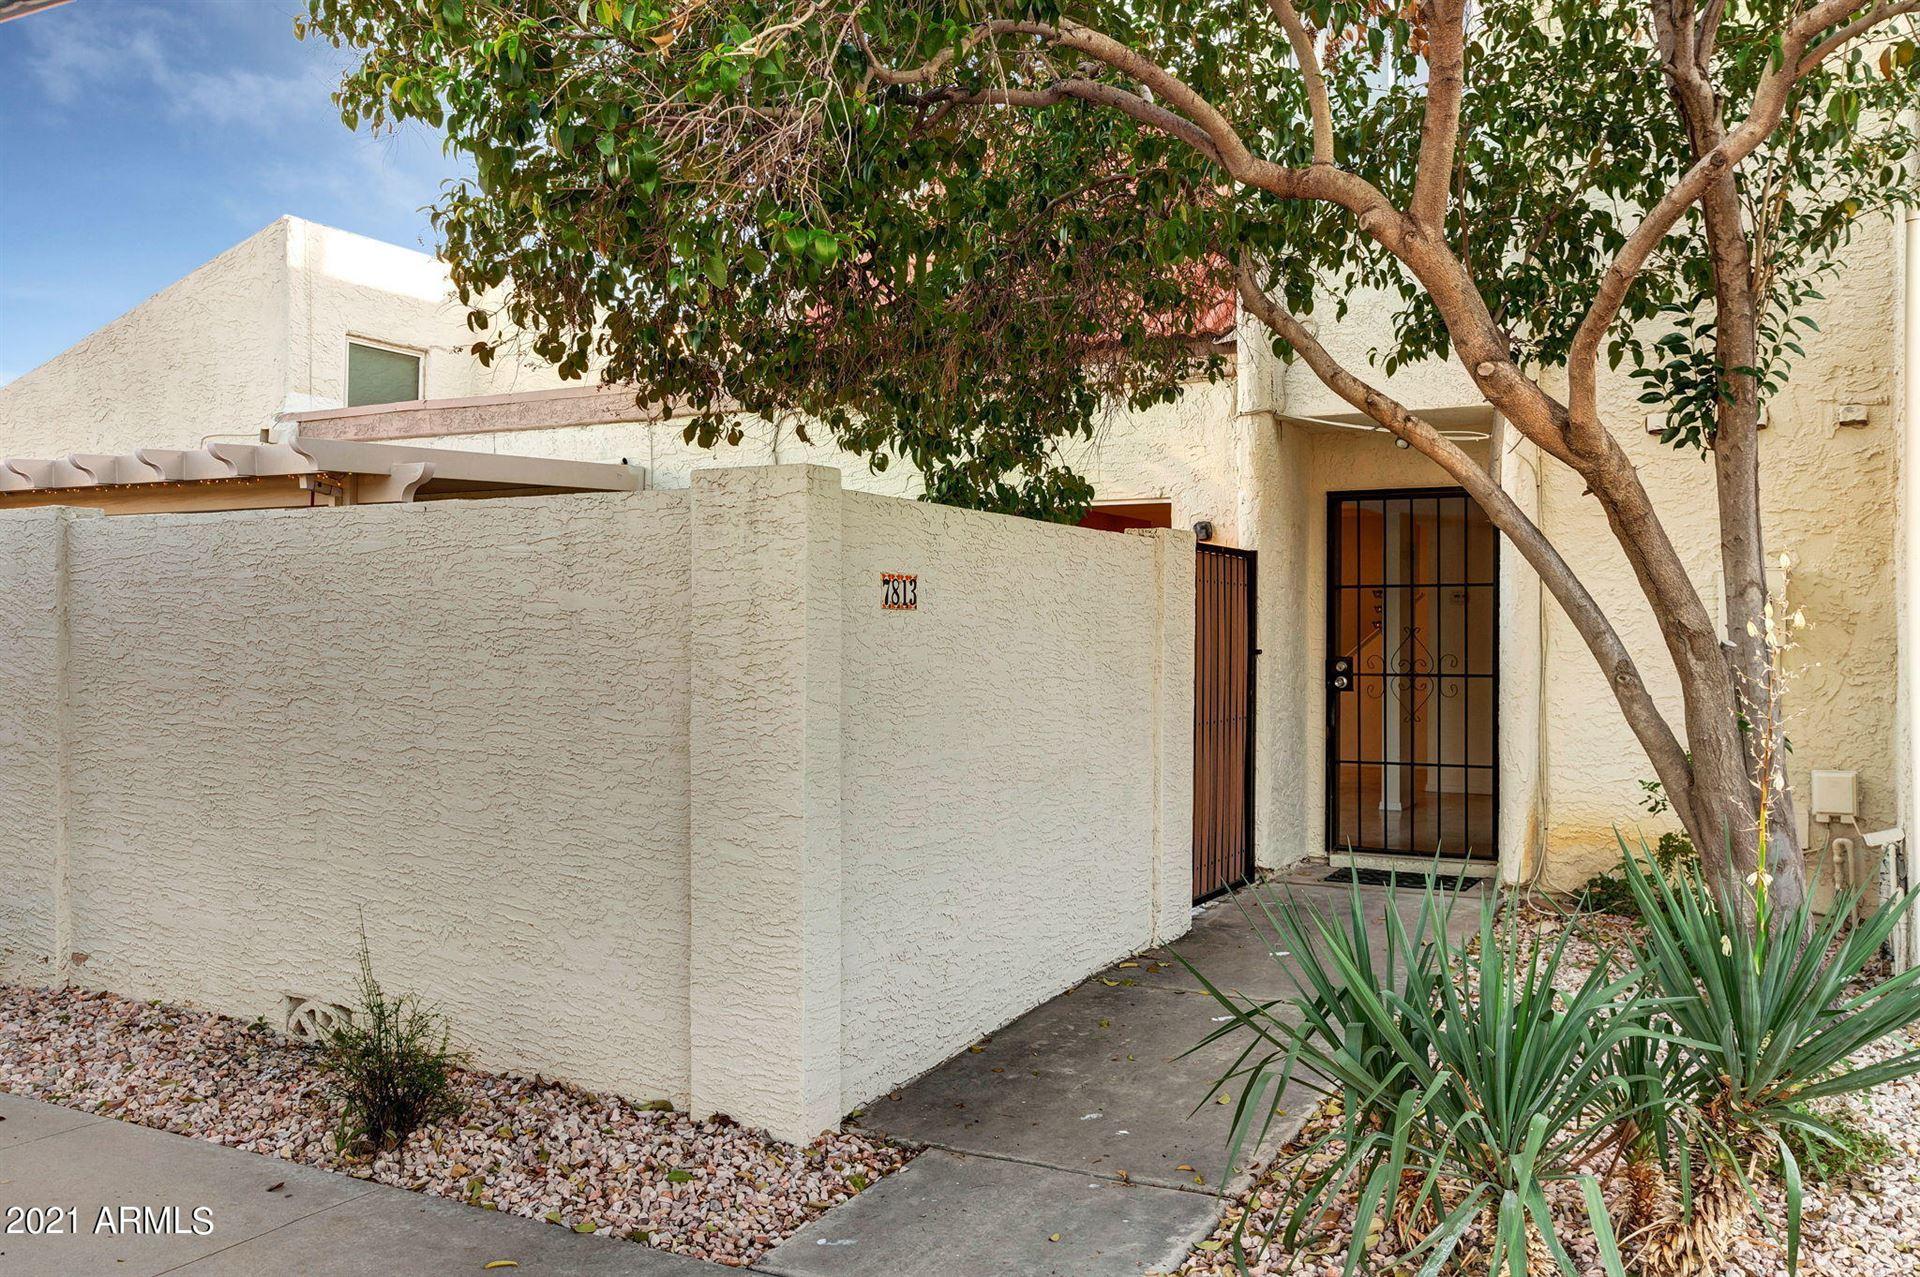 7813 E ROVEY Avenue, Scottsdale, AZ 85250 - MLS#: 6181705